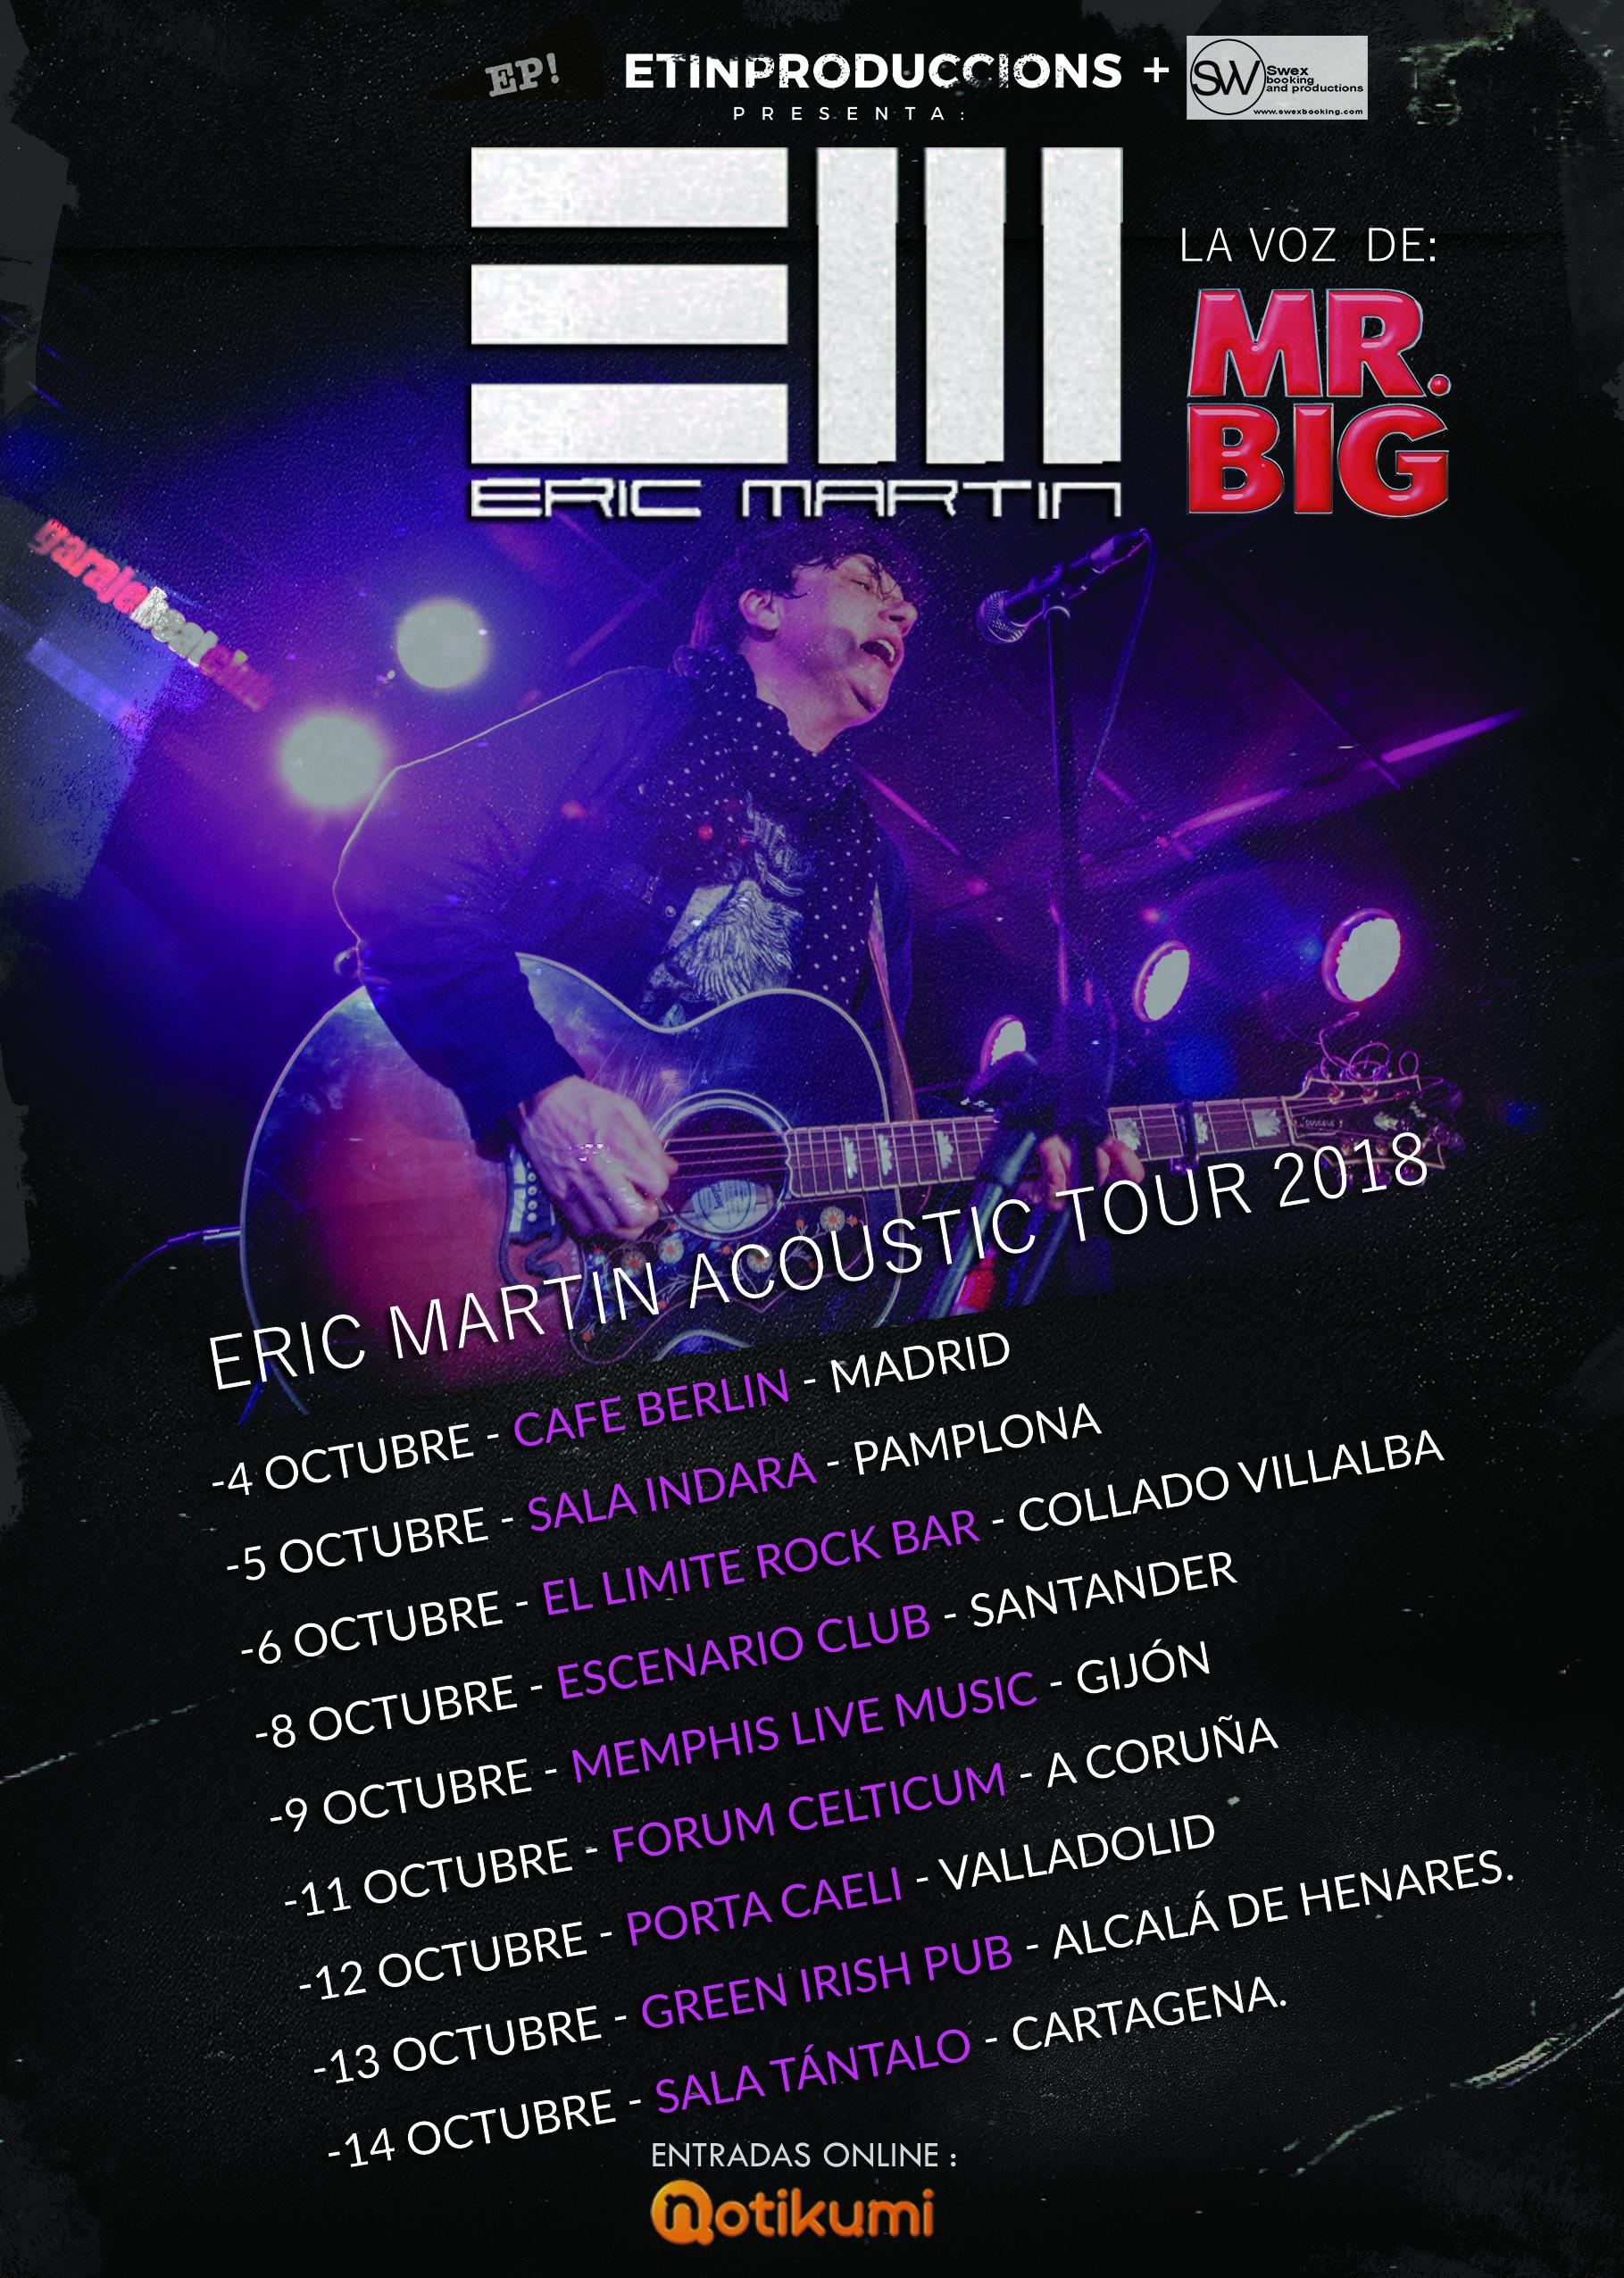 ERIC-MARTIN-ACUSTICO-2018-todas-las-fechas-2-2-FINAL